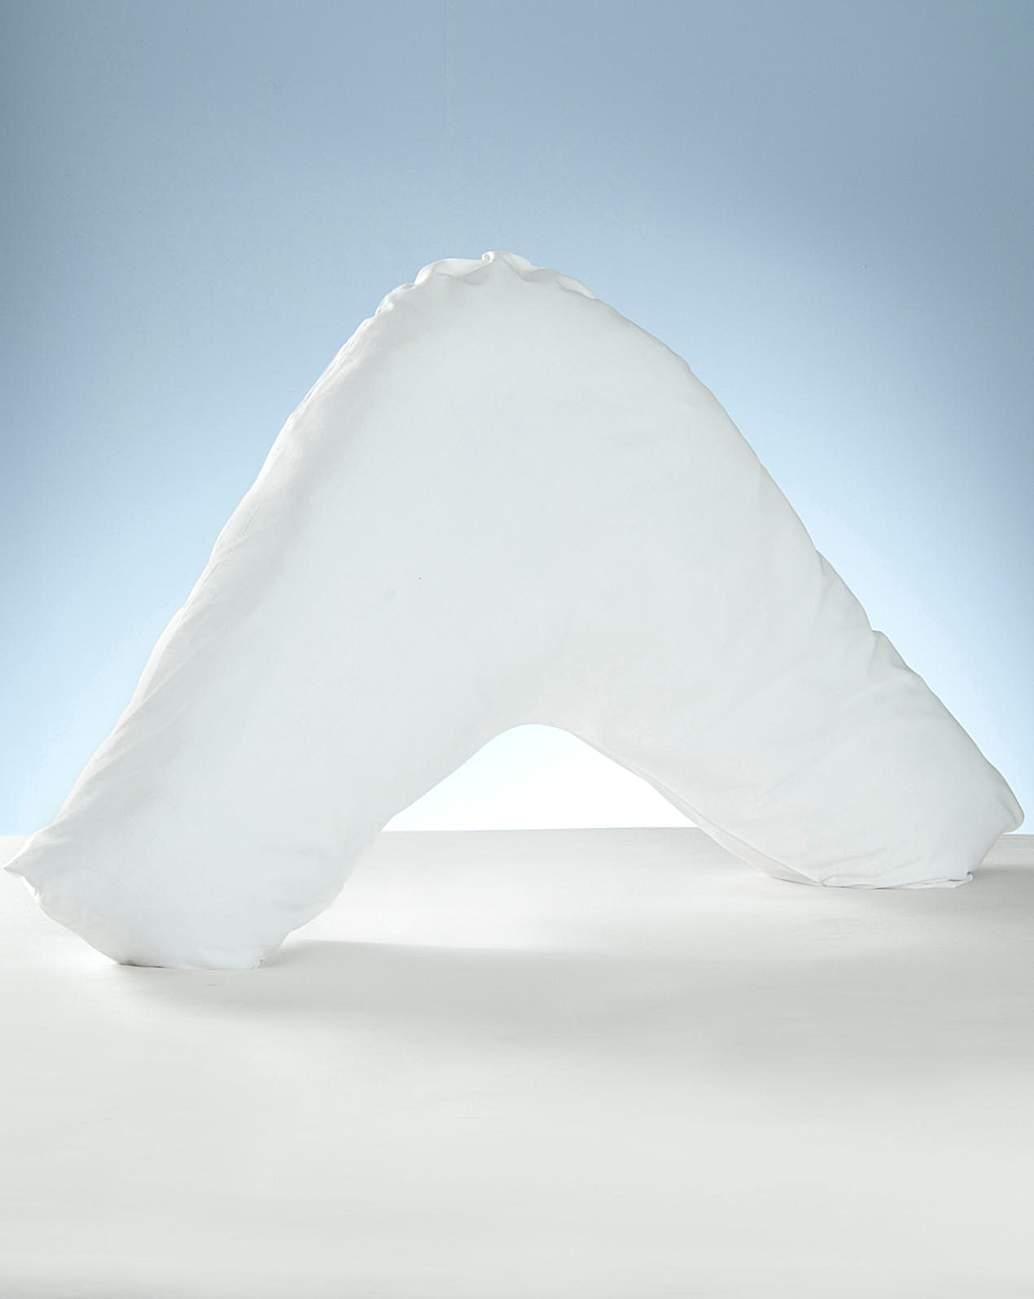 Pair of V Shaped Pillowcases | Studio